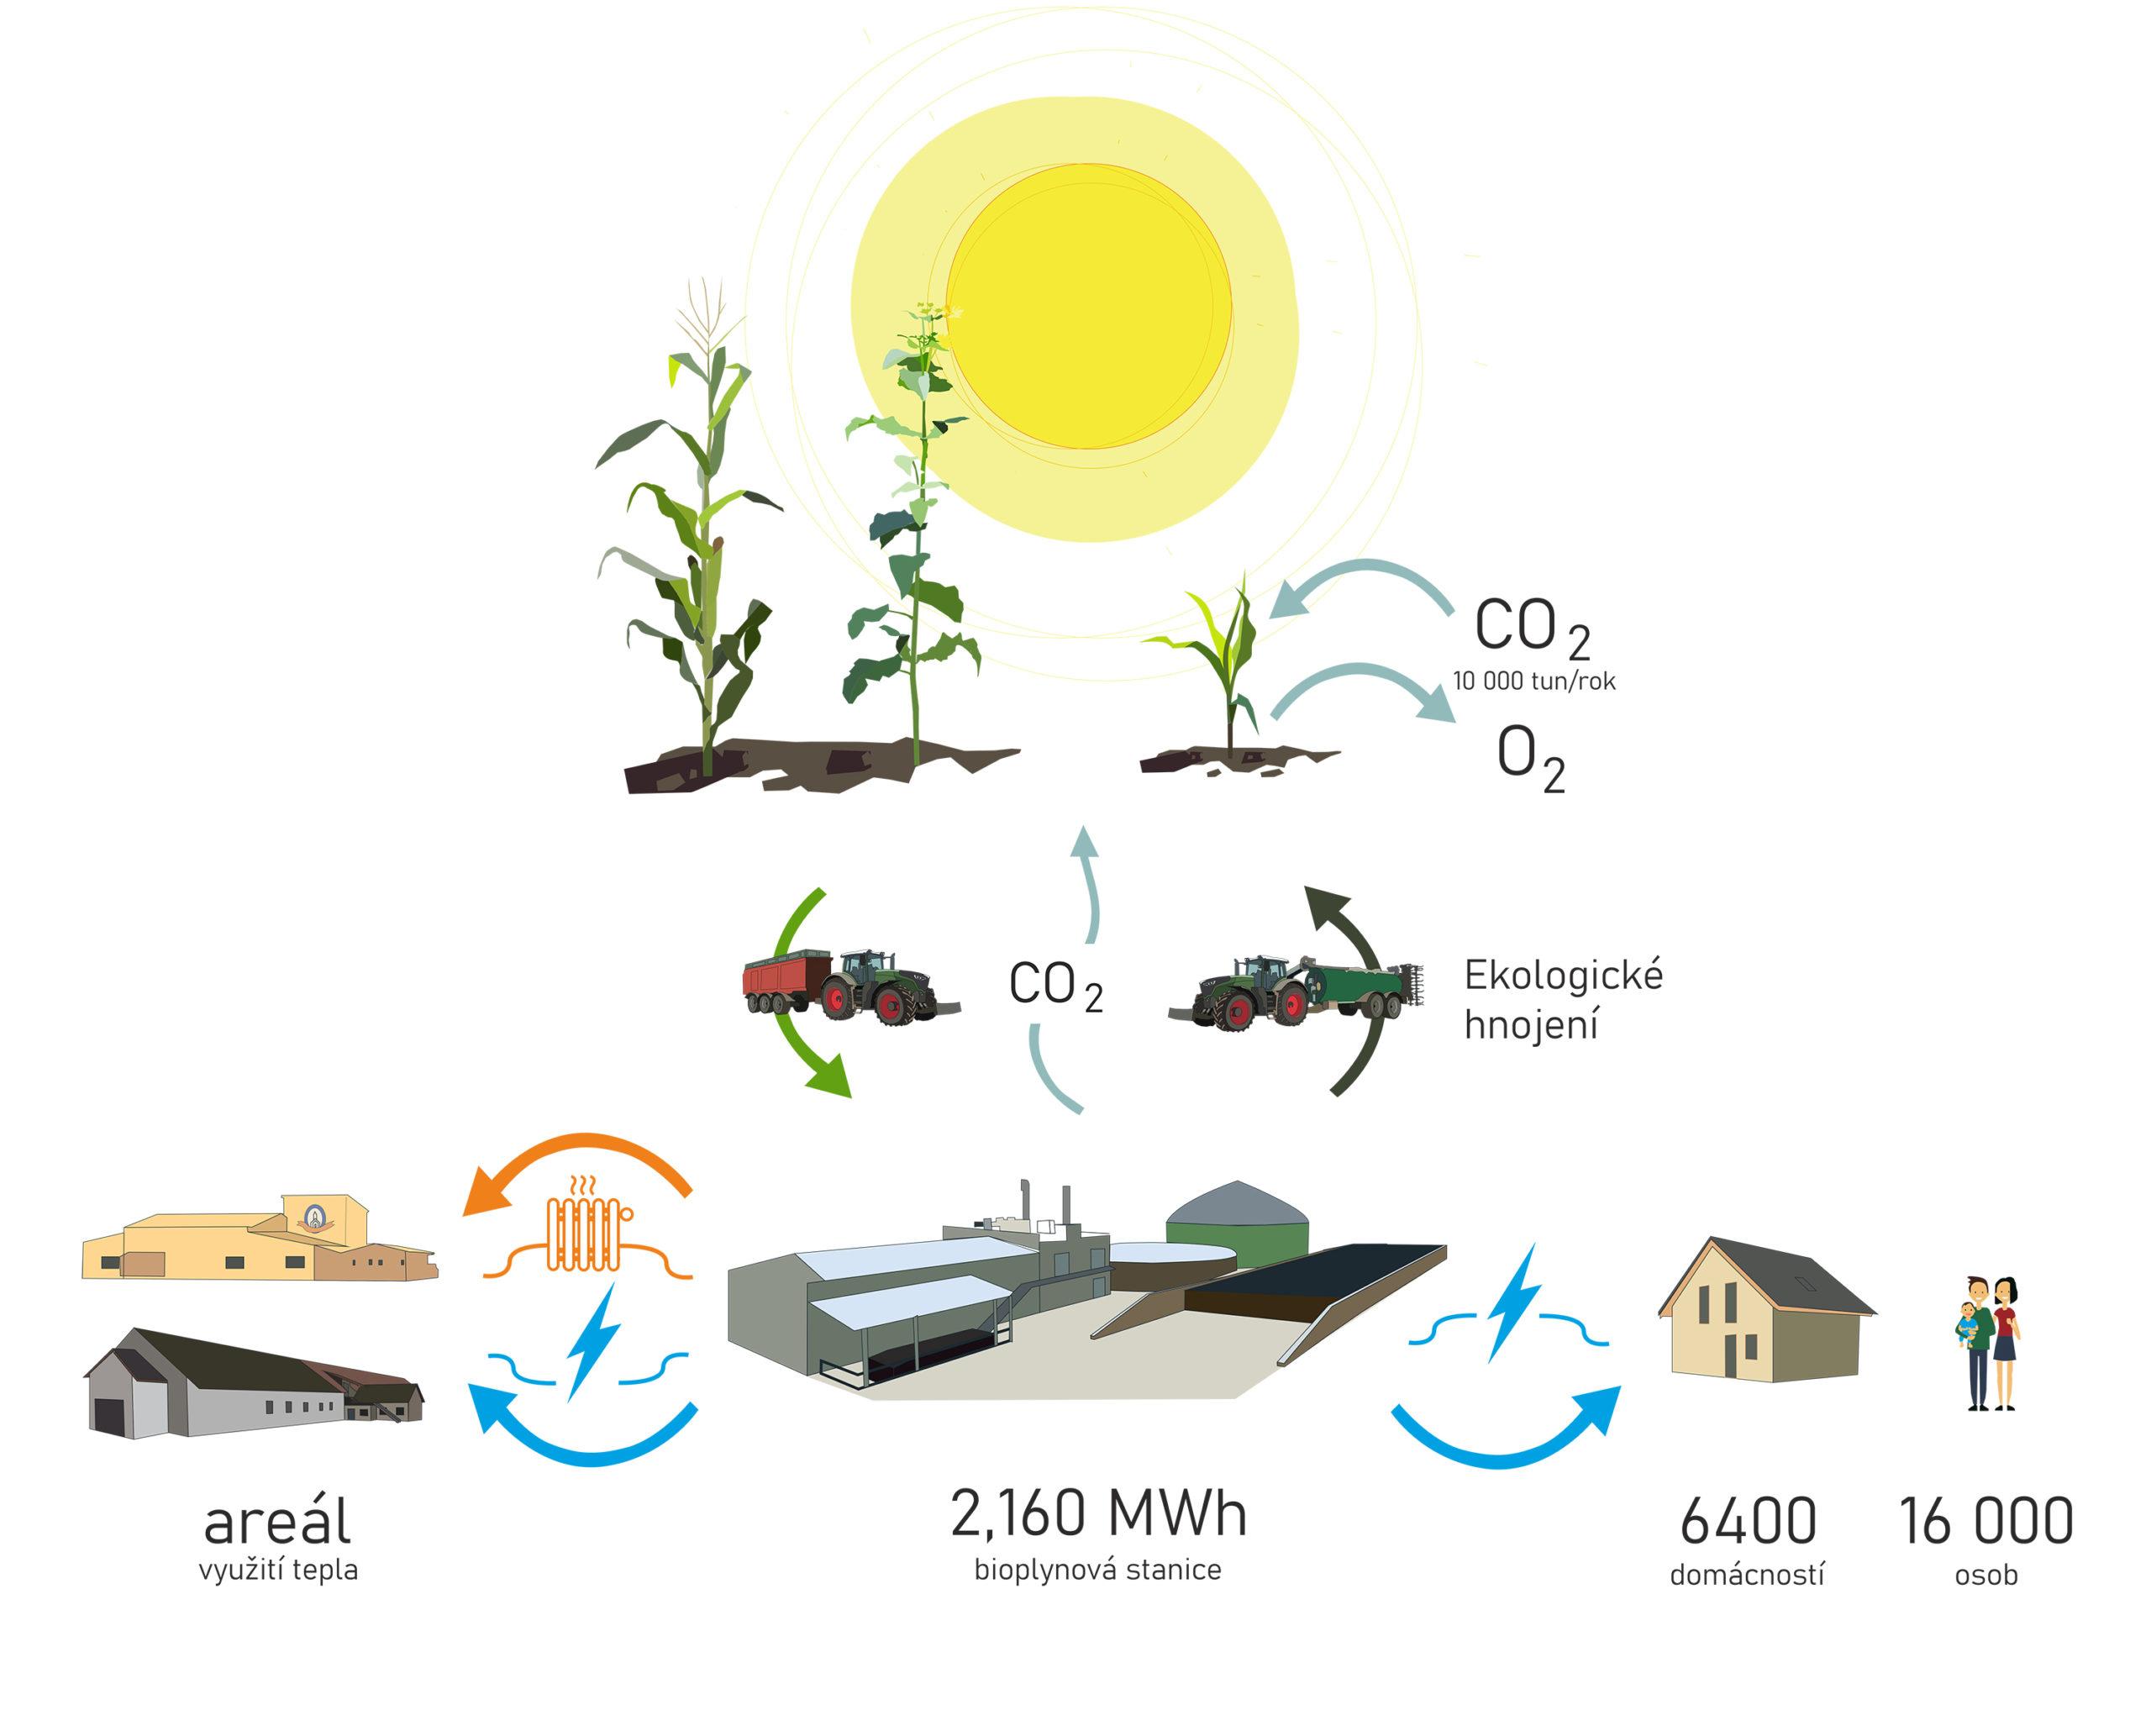 Graf bioplynové stanice